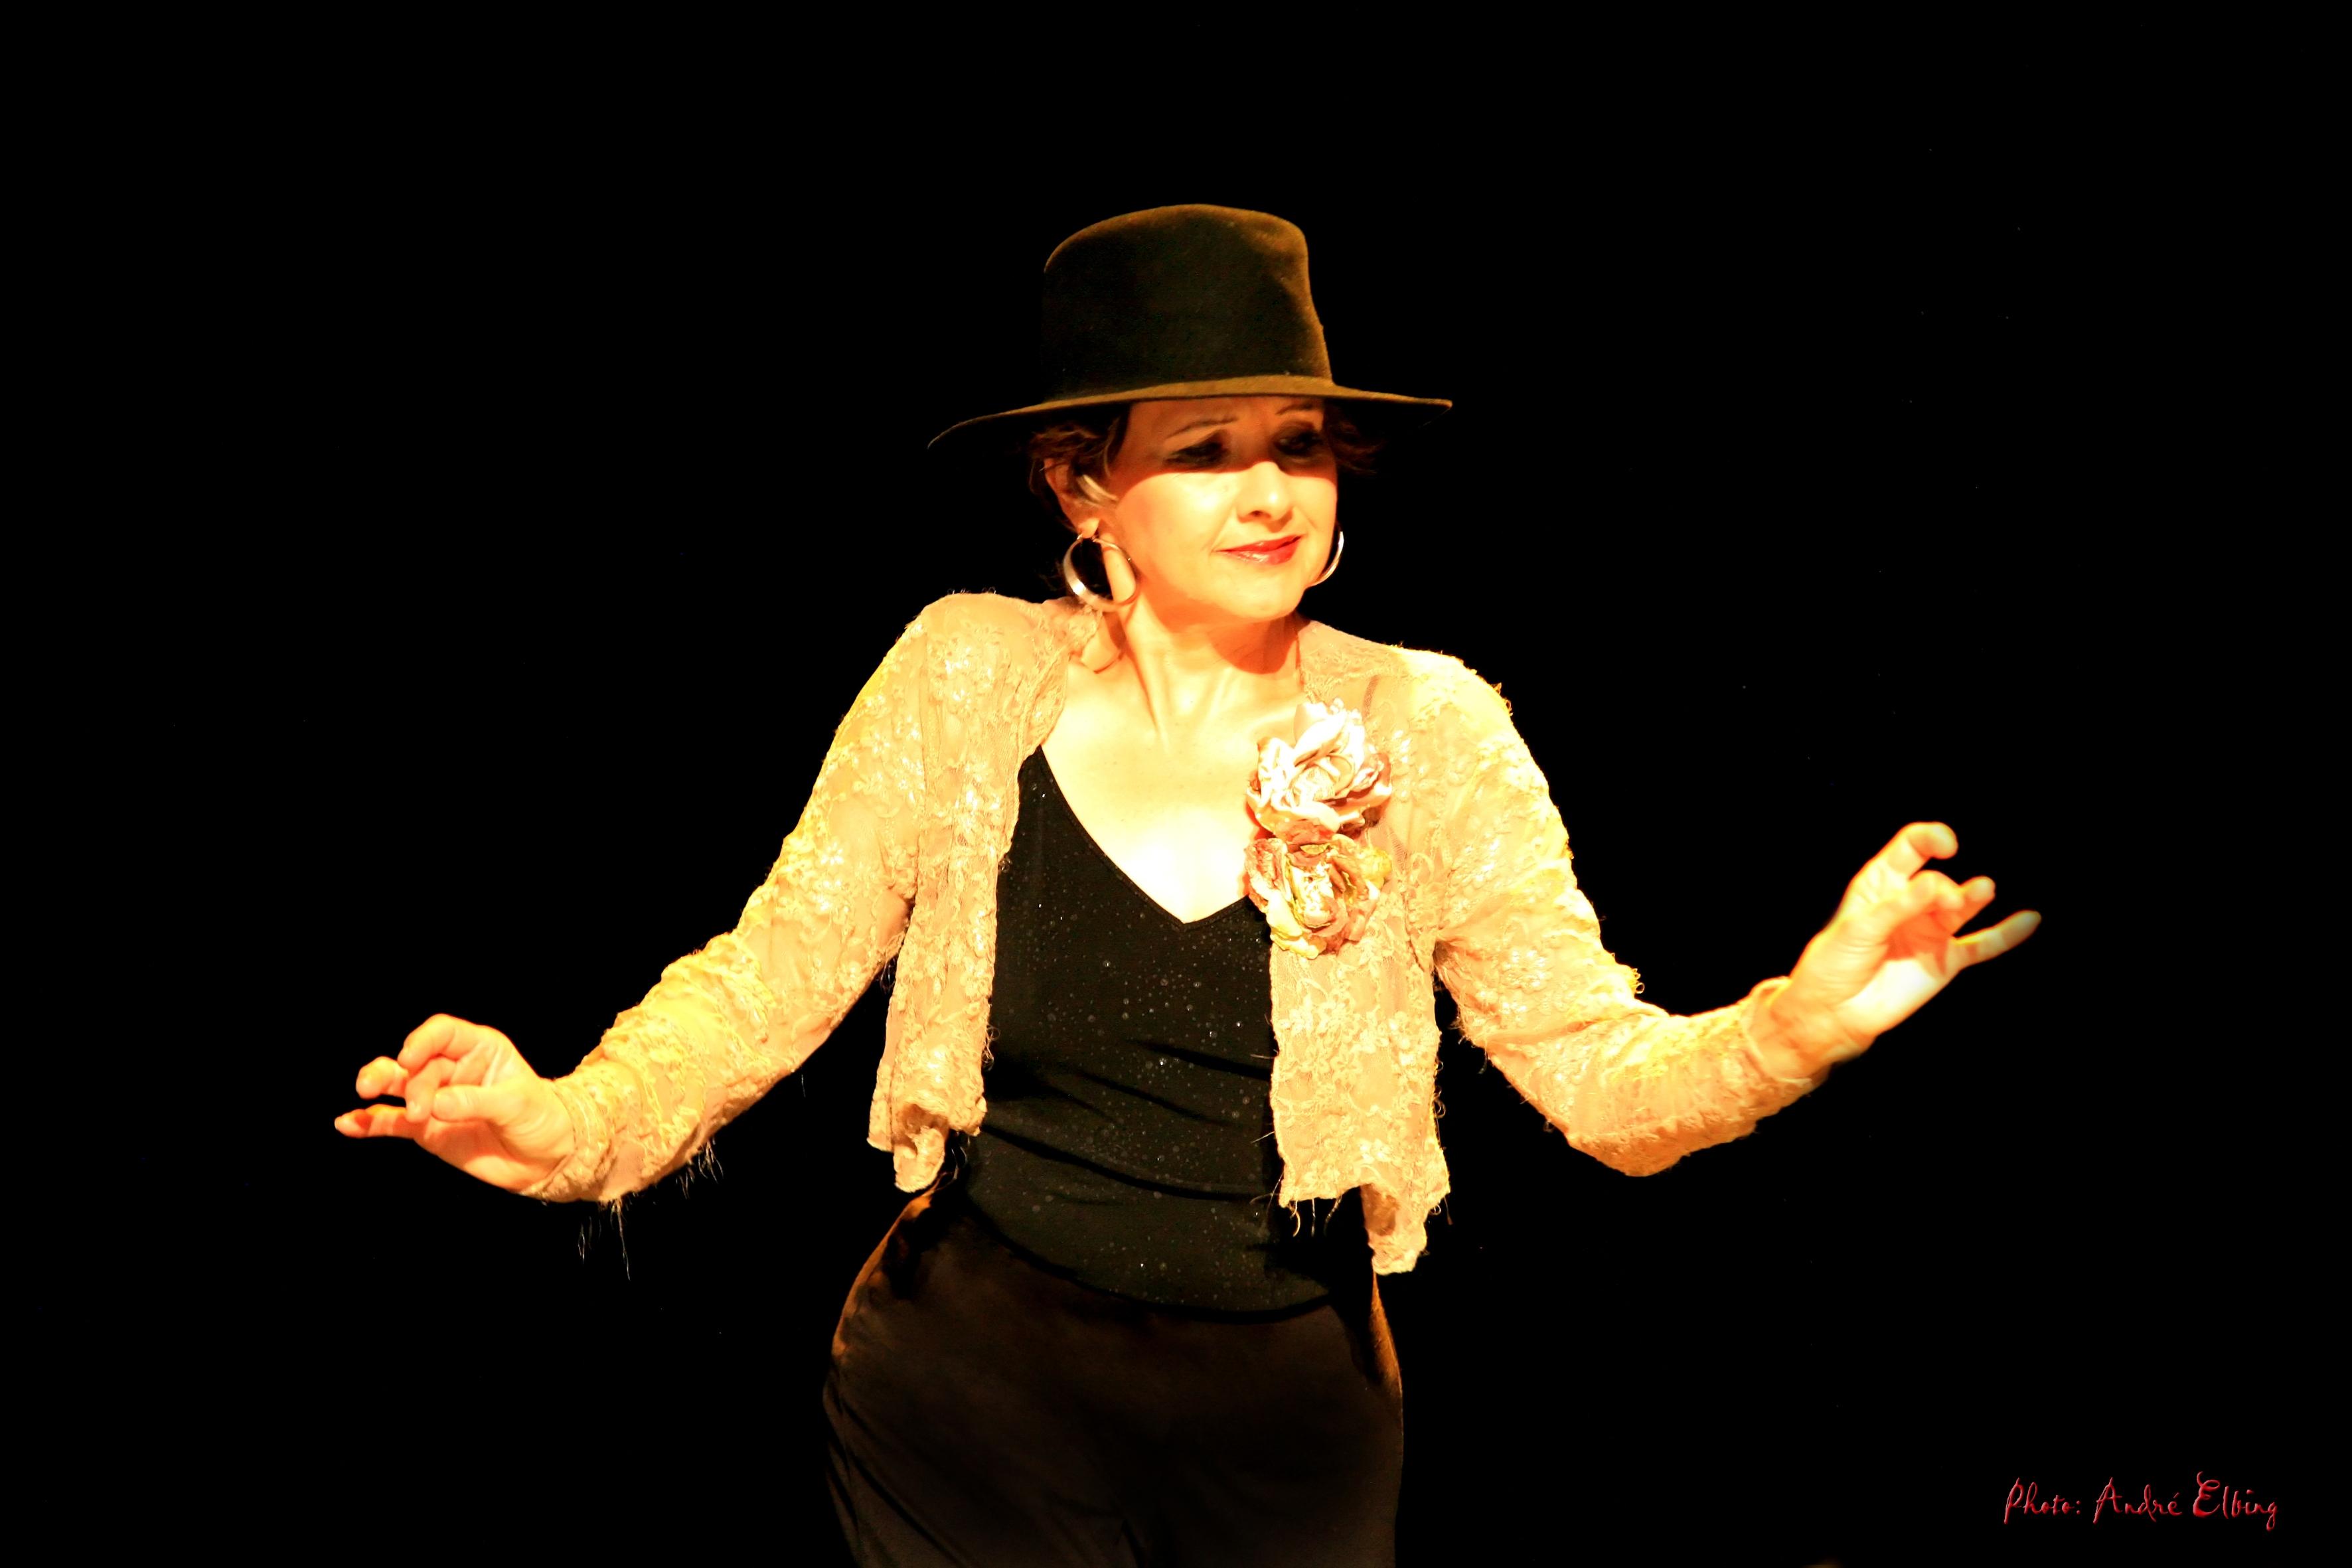 Wendy Buonaventura Hanover 2012